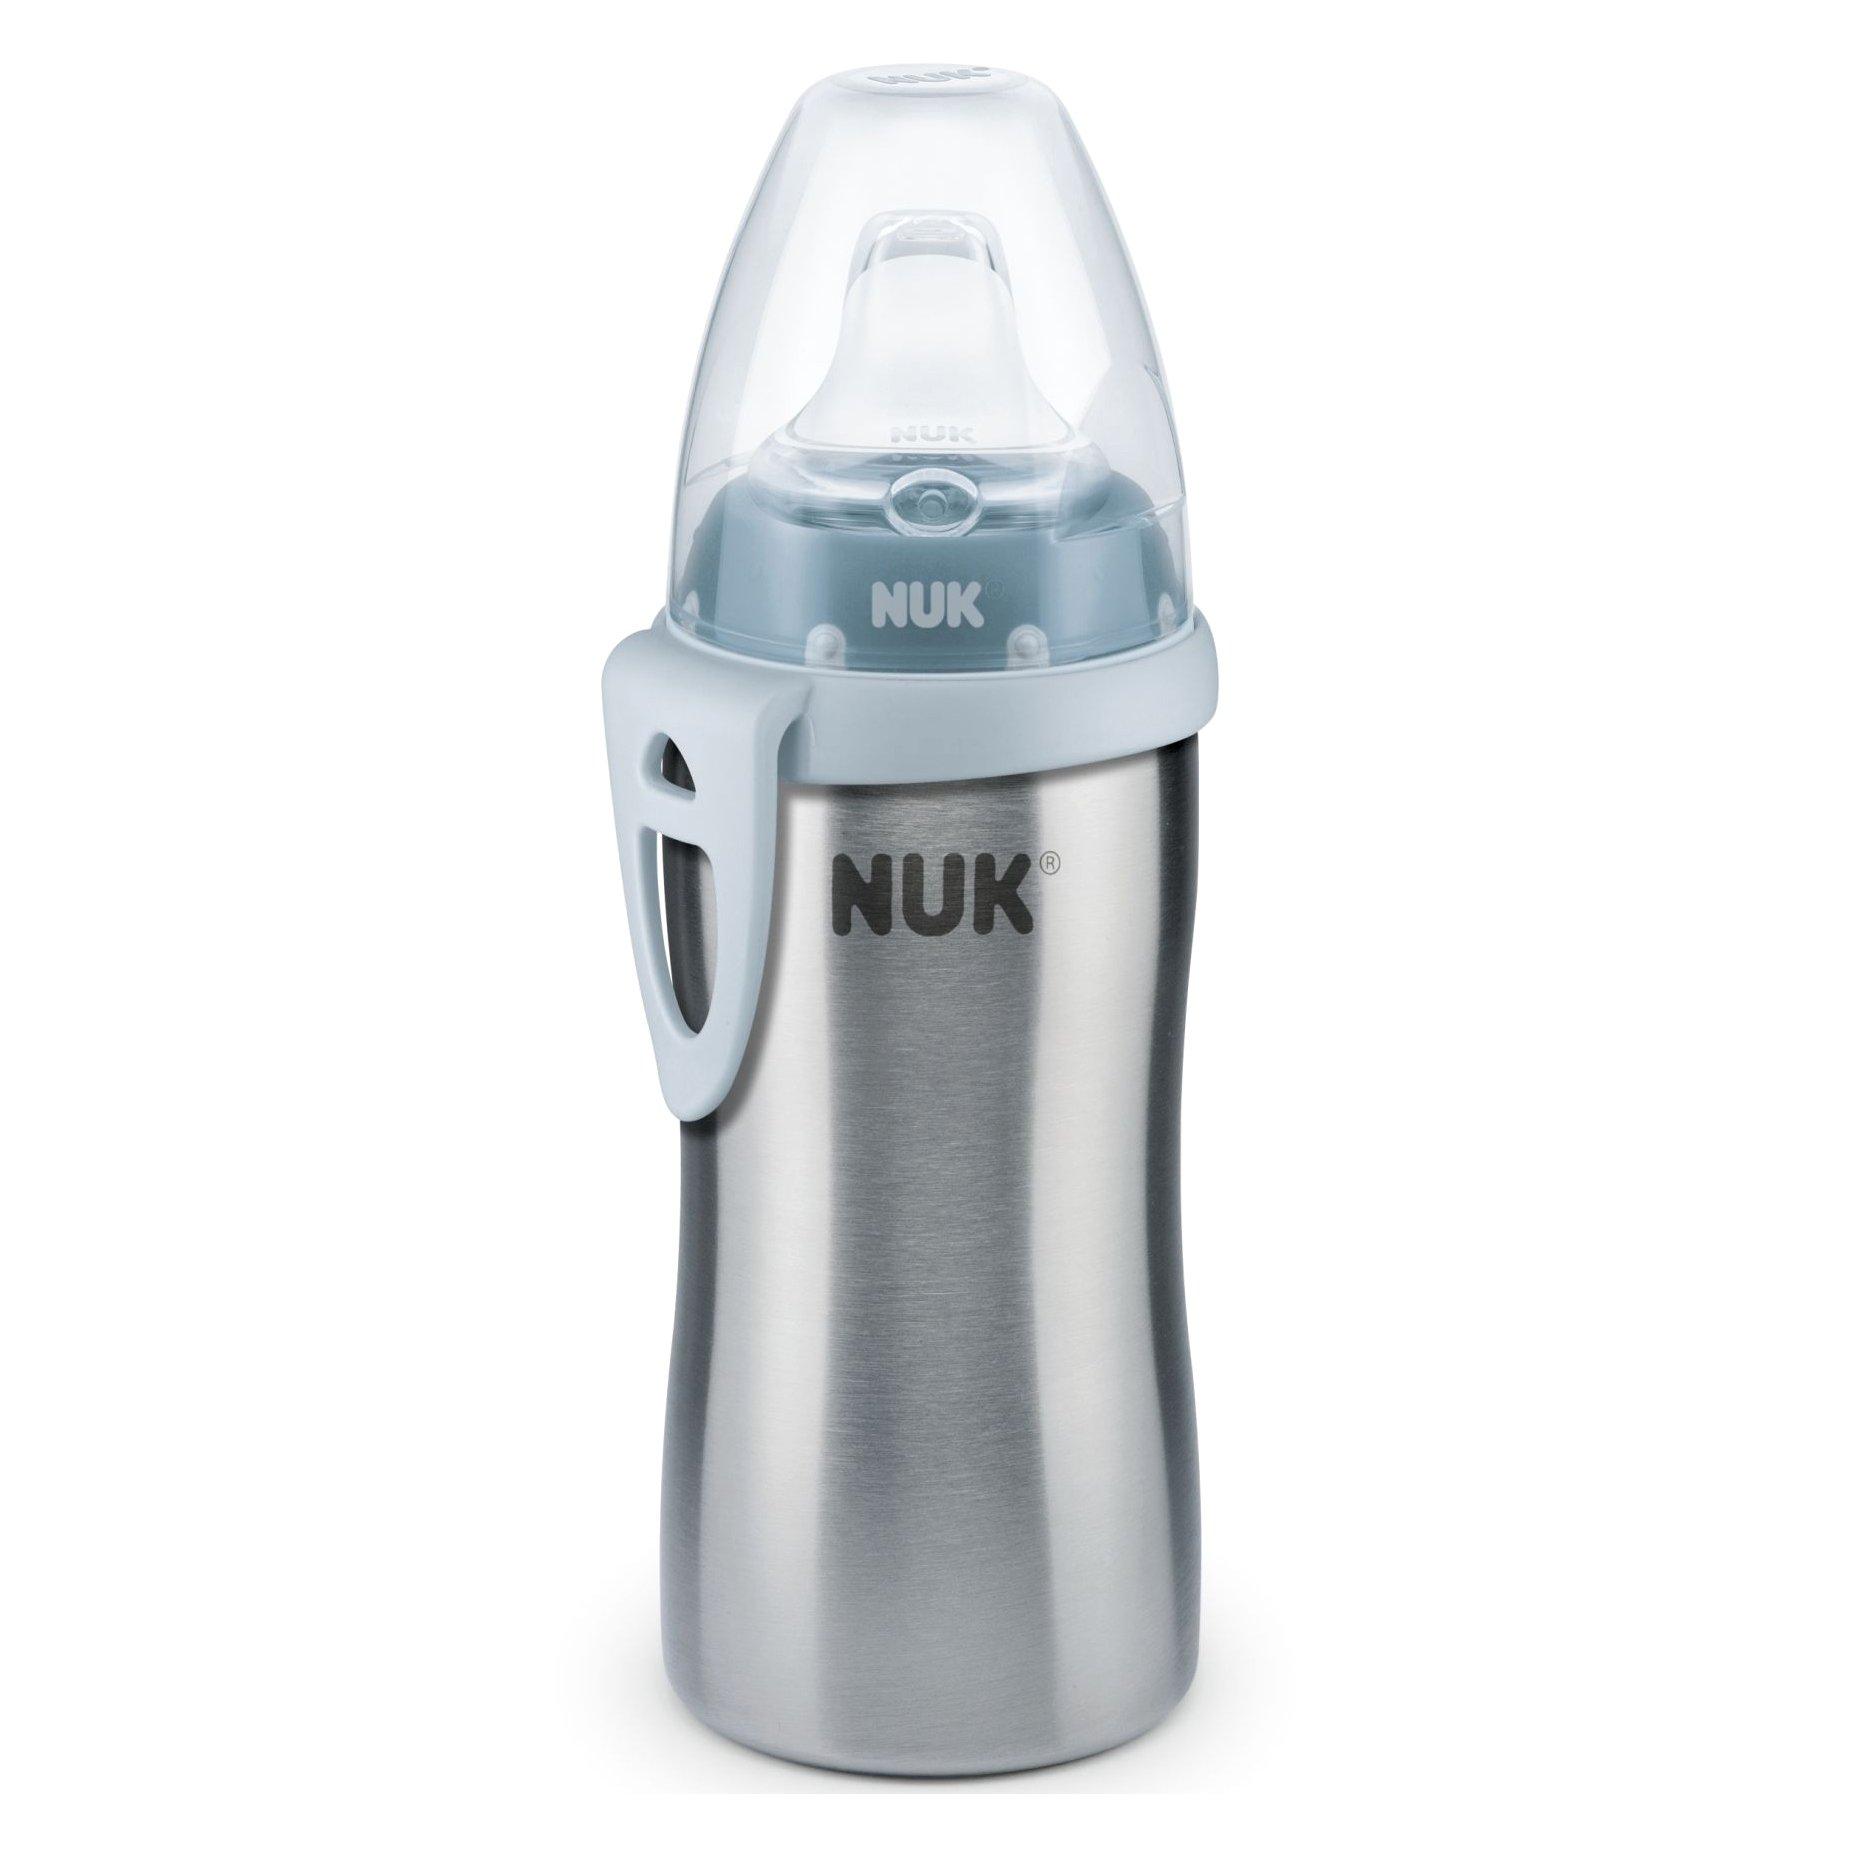 Nuk Kiddy Cup PP Παγουράκι Από Ανοξείδωτο Ατσάλι με Ρύγχος & Κλιπ 12m+ , 300ml – γκρι